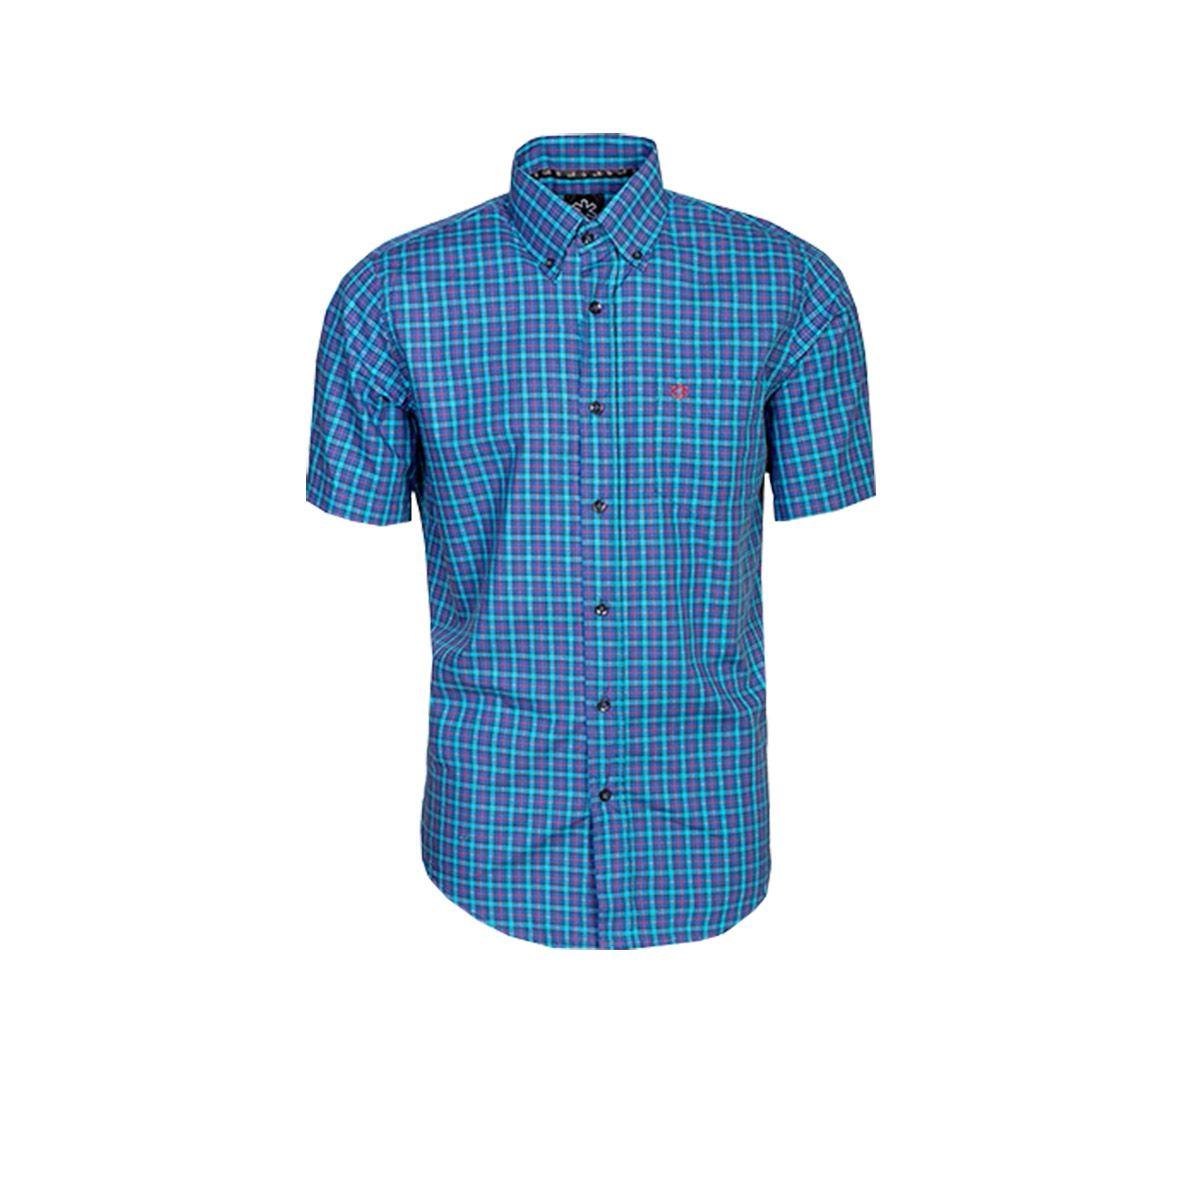 Camisa Tuff Manga Curta Xadrez Azul Marinho E Turquesa